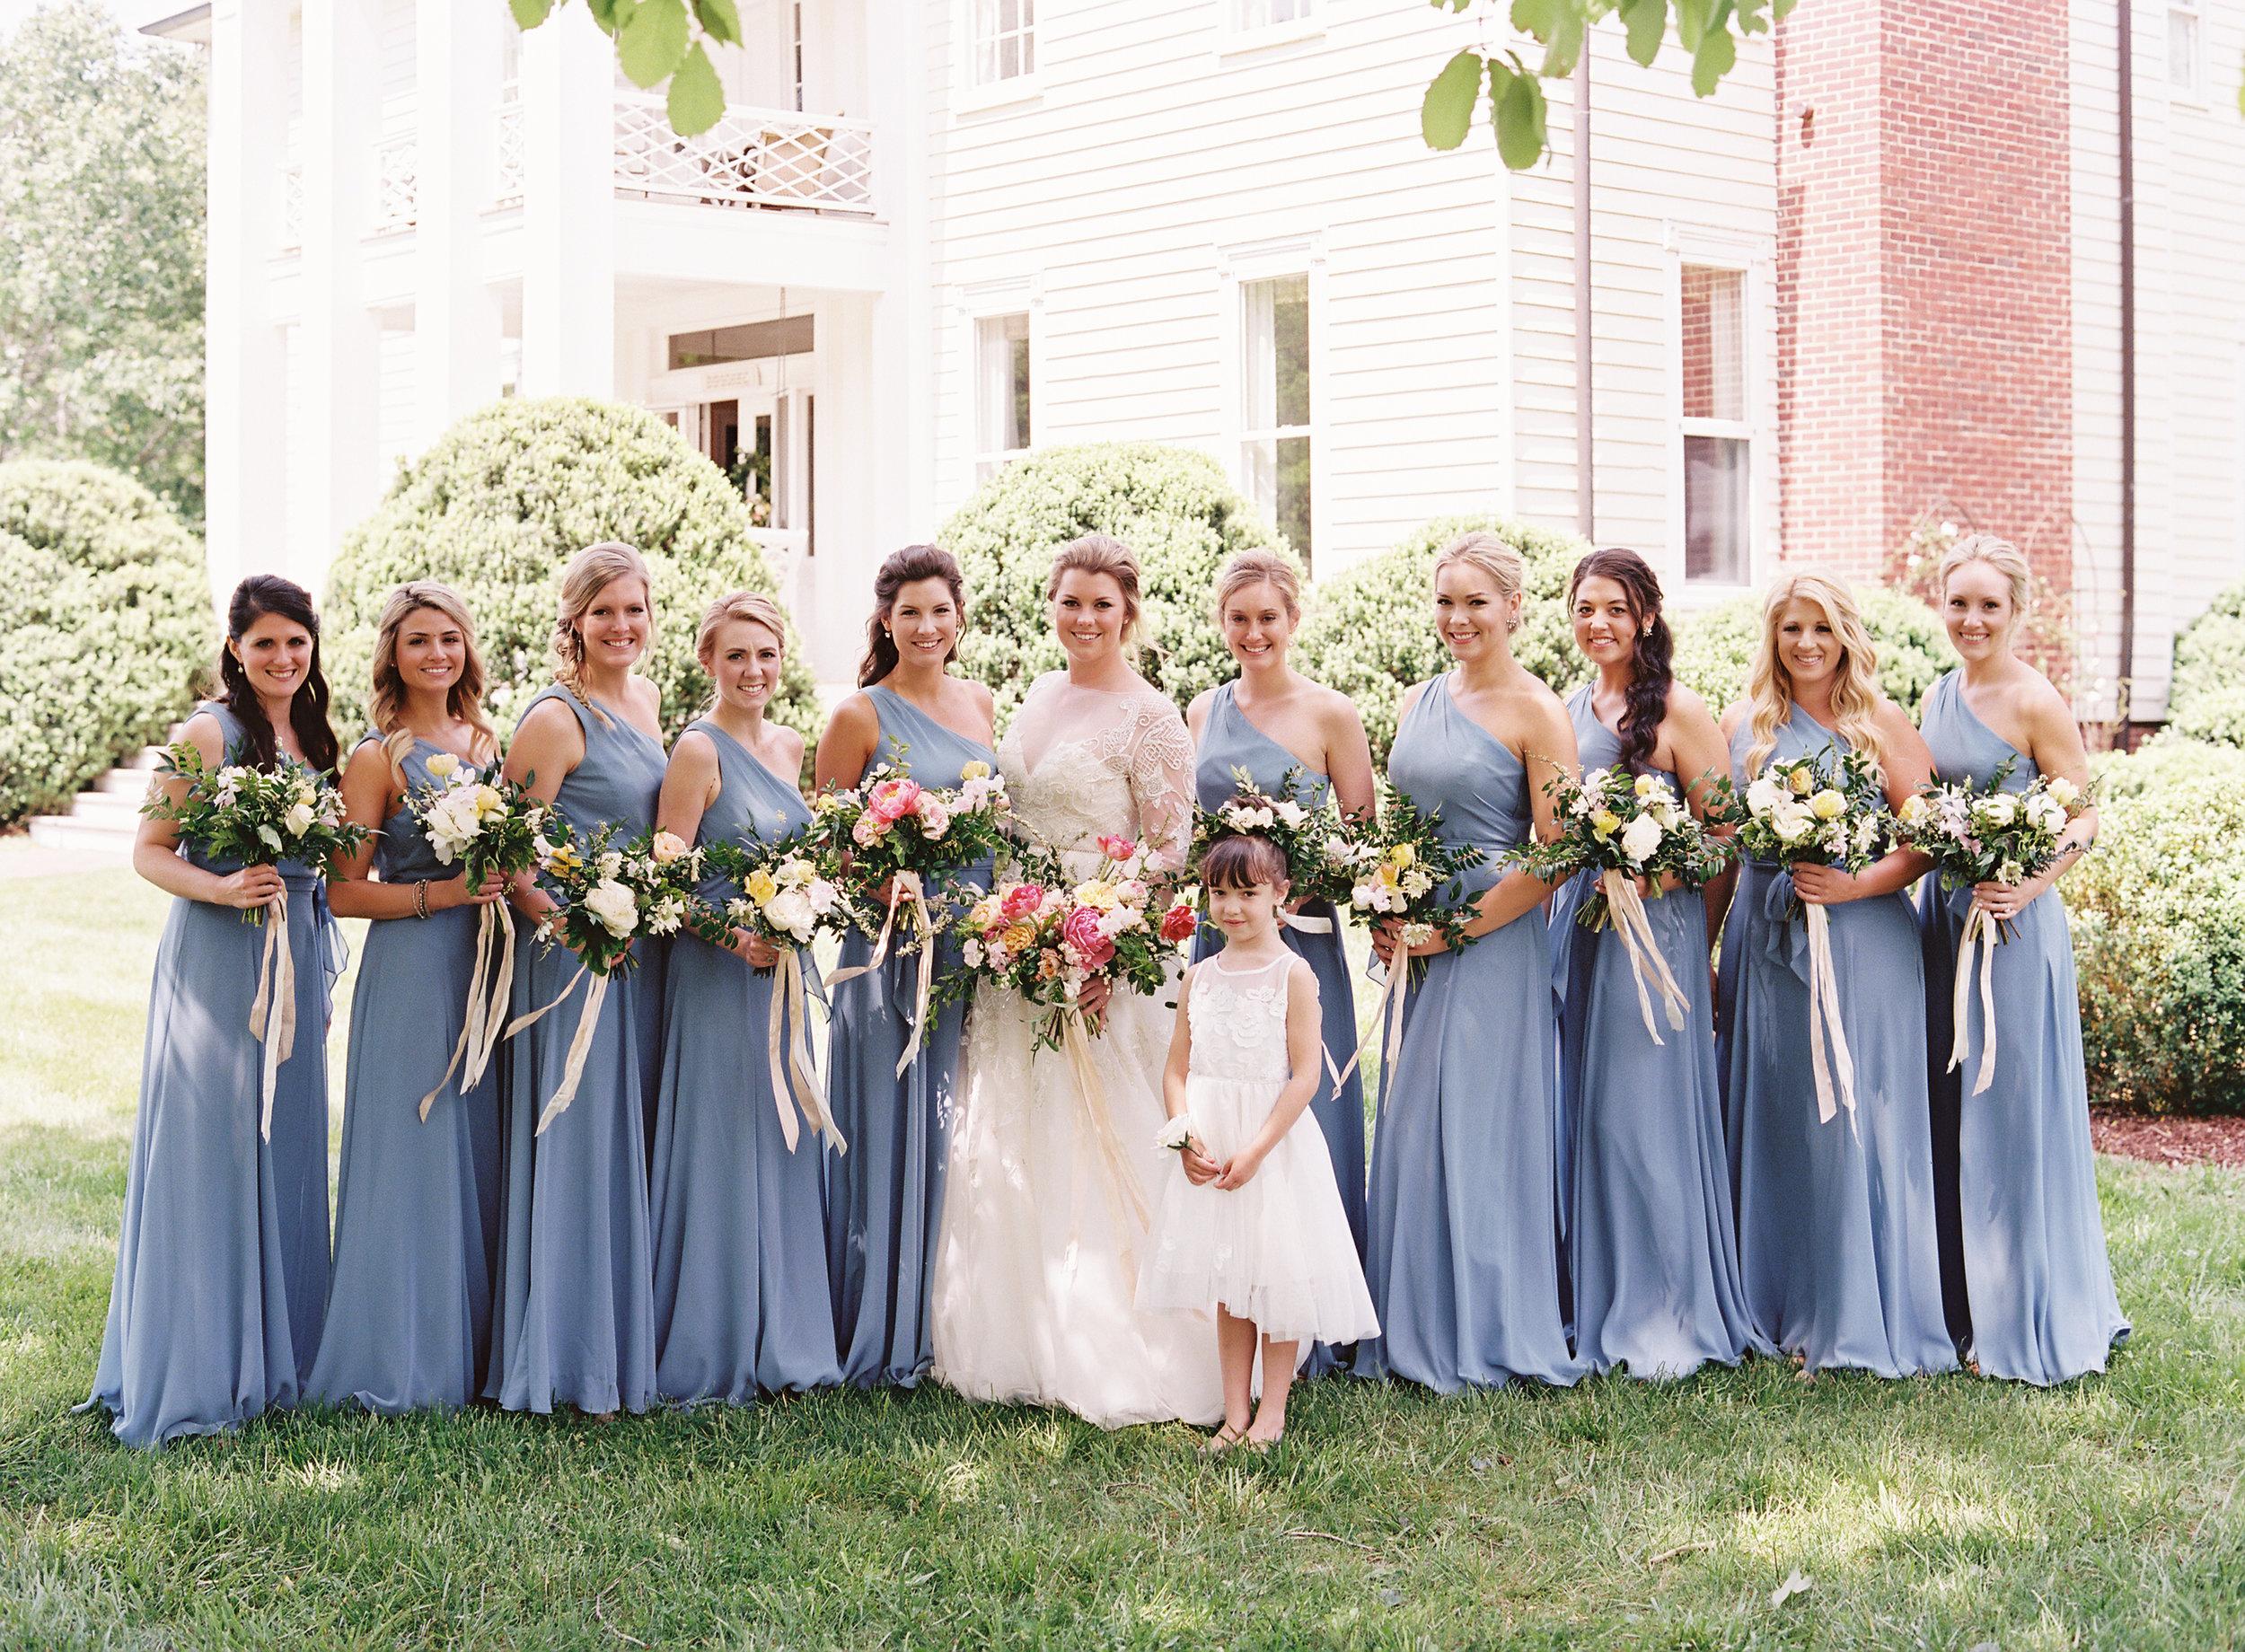 Bridal Party Portraits at the bride's childhood home // Franklin, TN Wedding Floral Designer